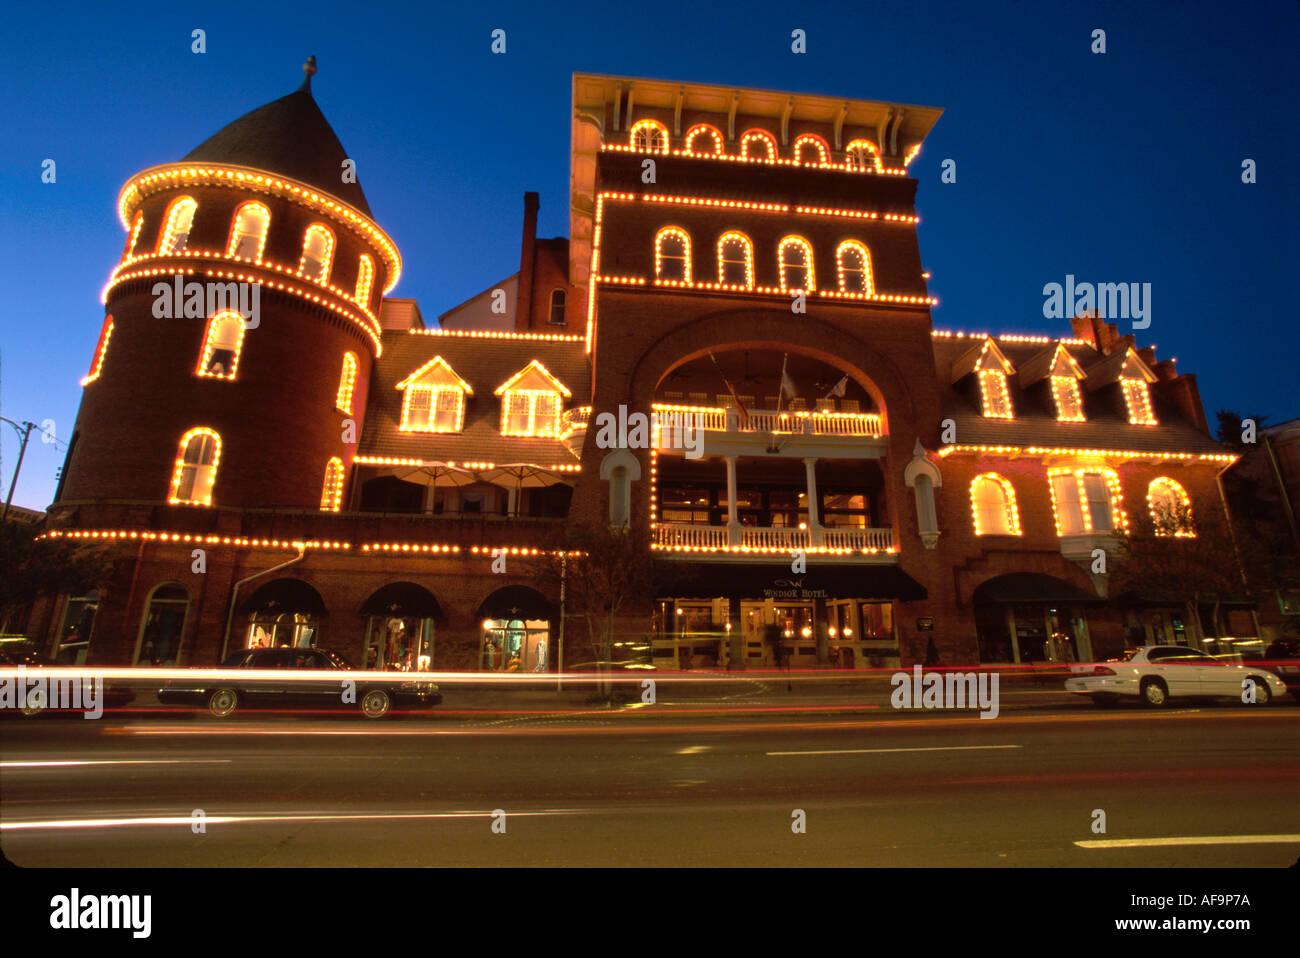 Georgia Hotels Stock Photos & Georgia Hotels Stock Images - Alamy